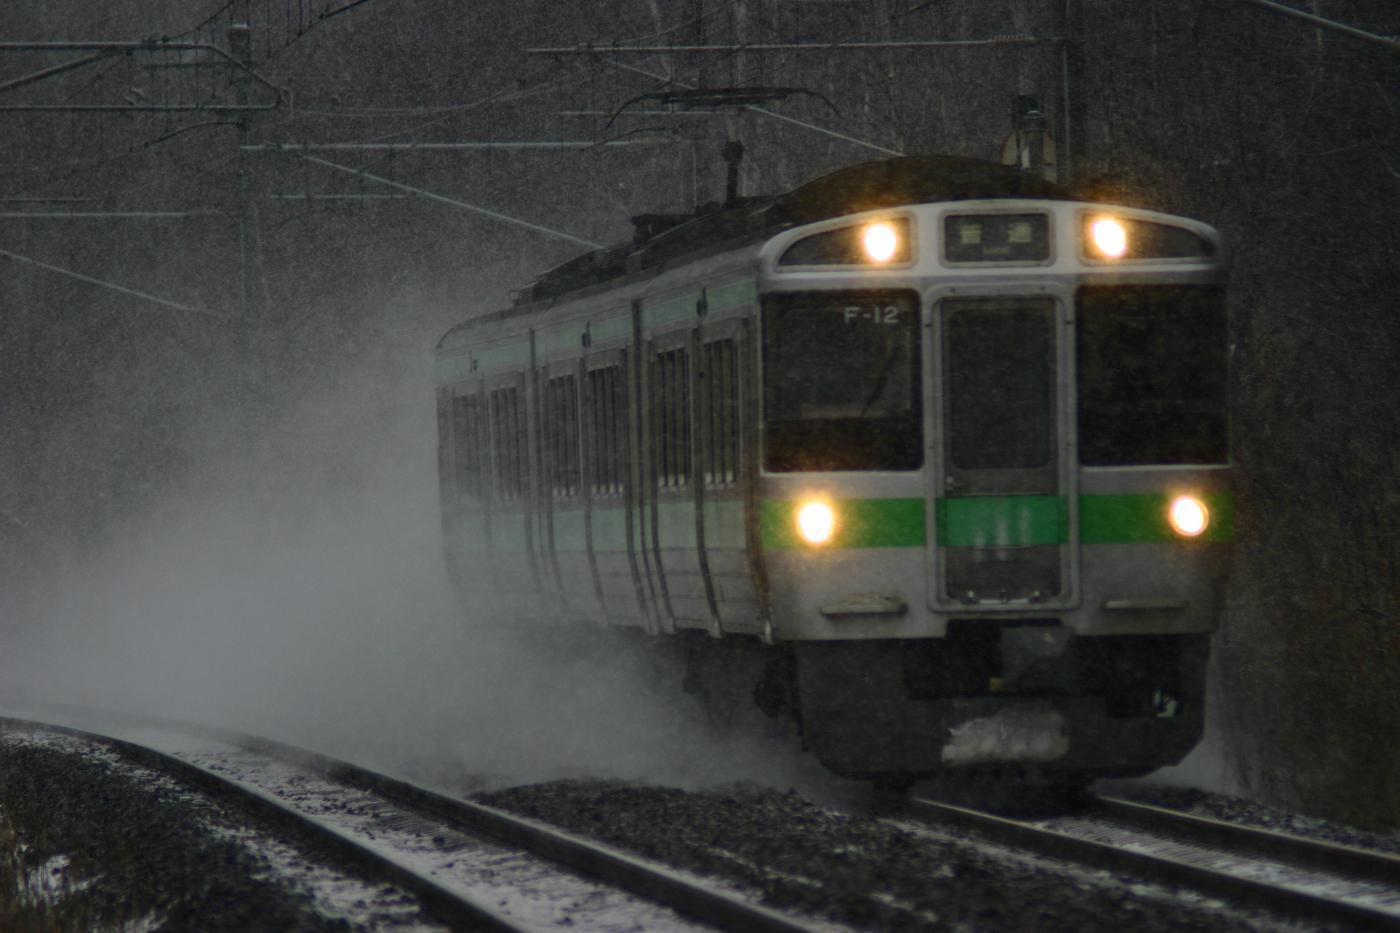 Jr111204007